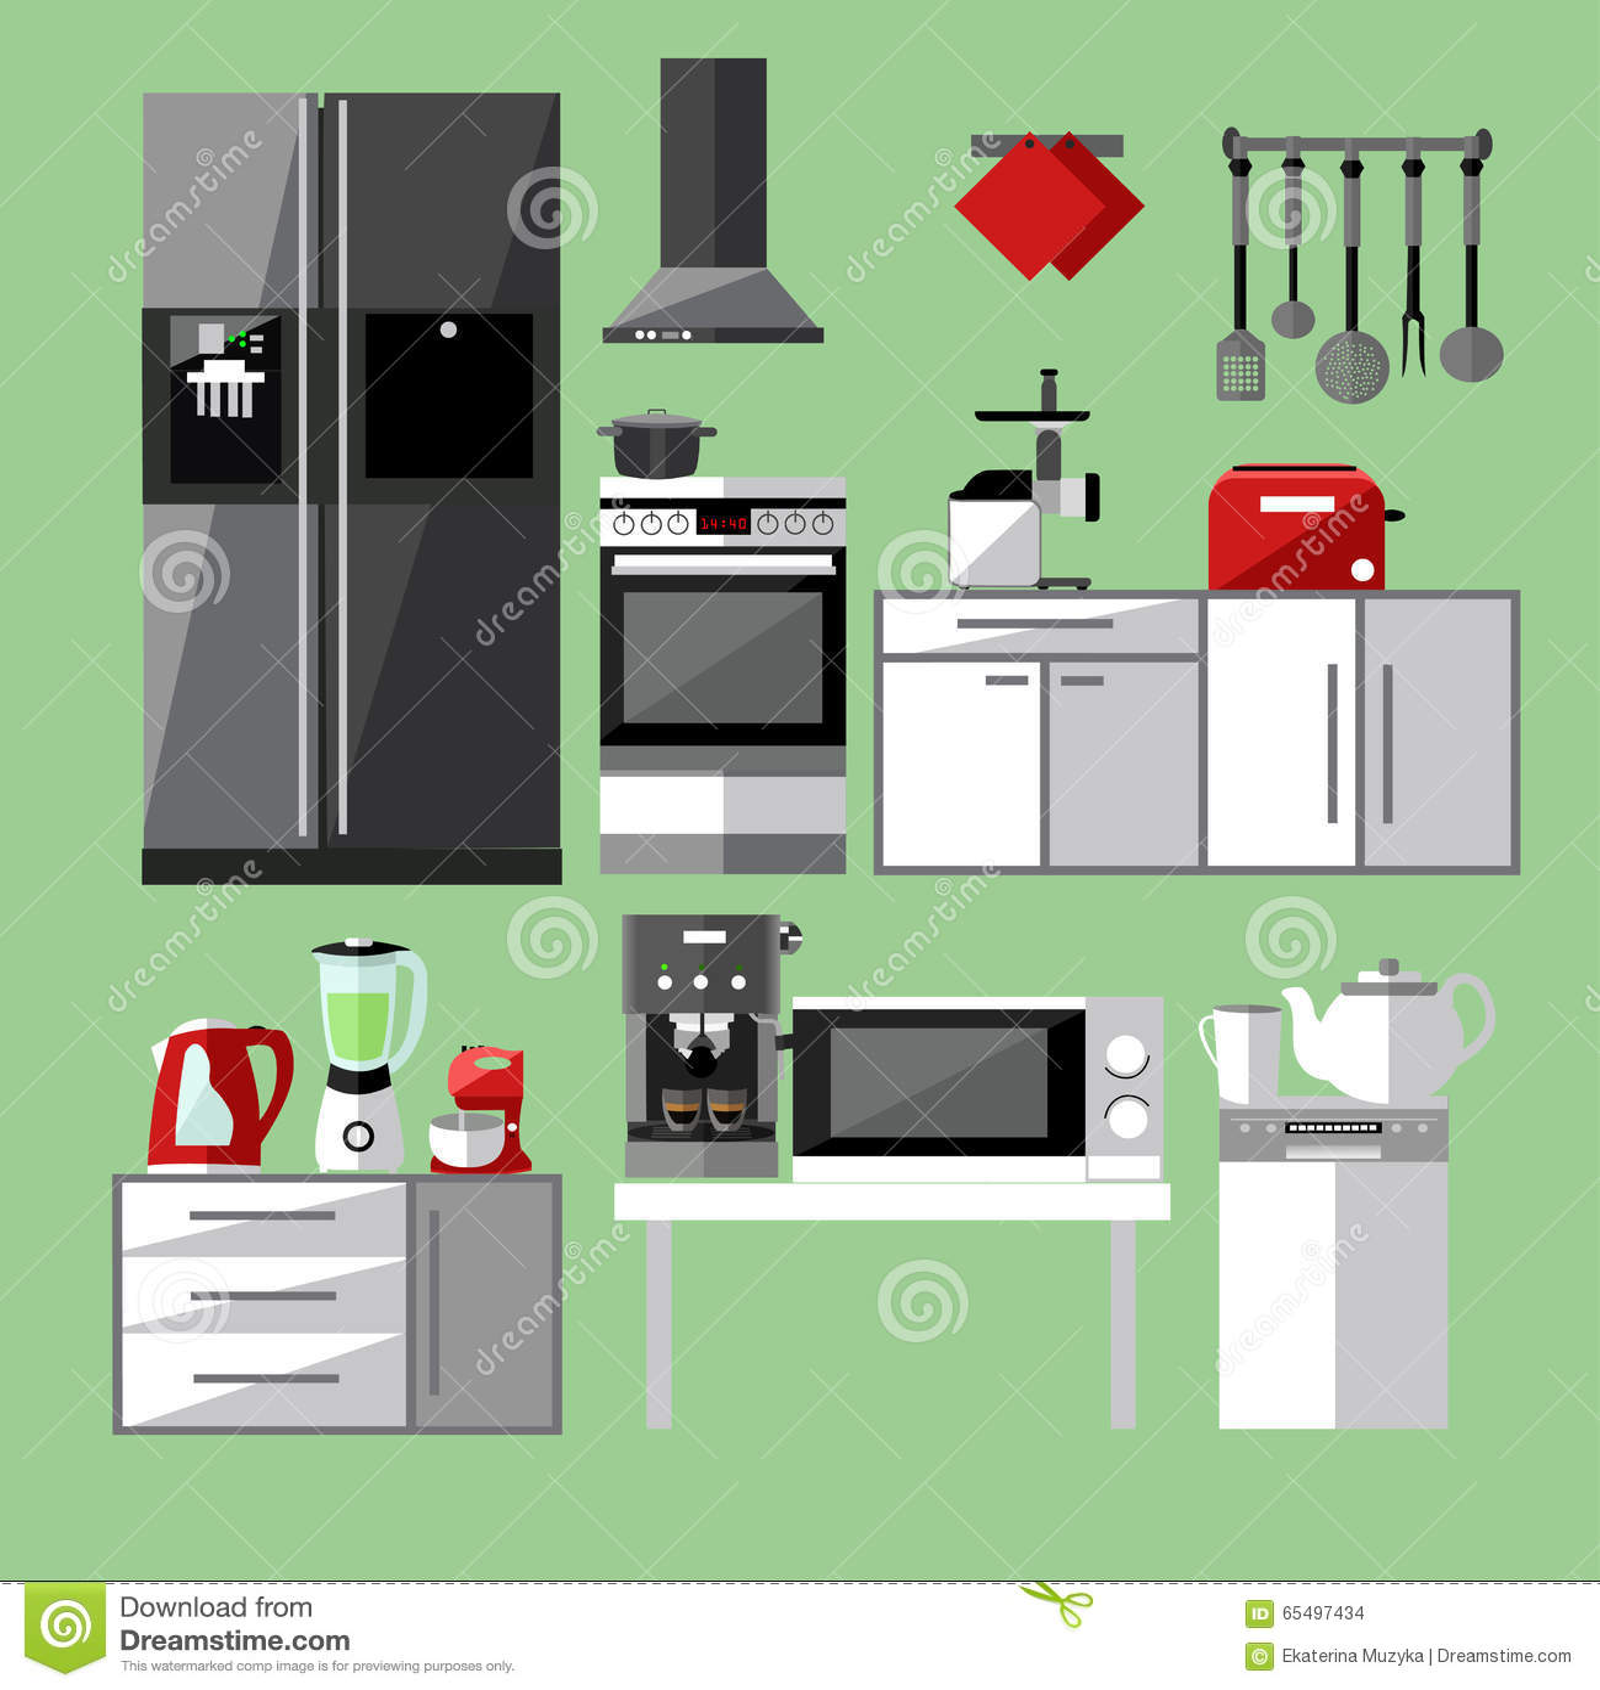 Modern Kitchen Appliances Set Vector Illustration Stock Vector Image 65497434